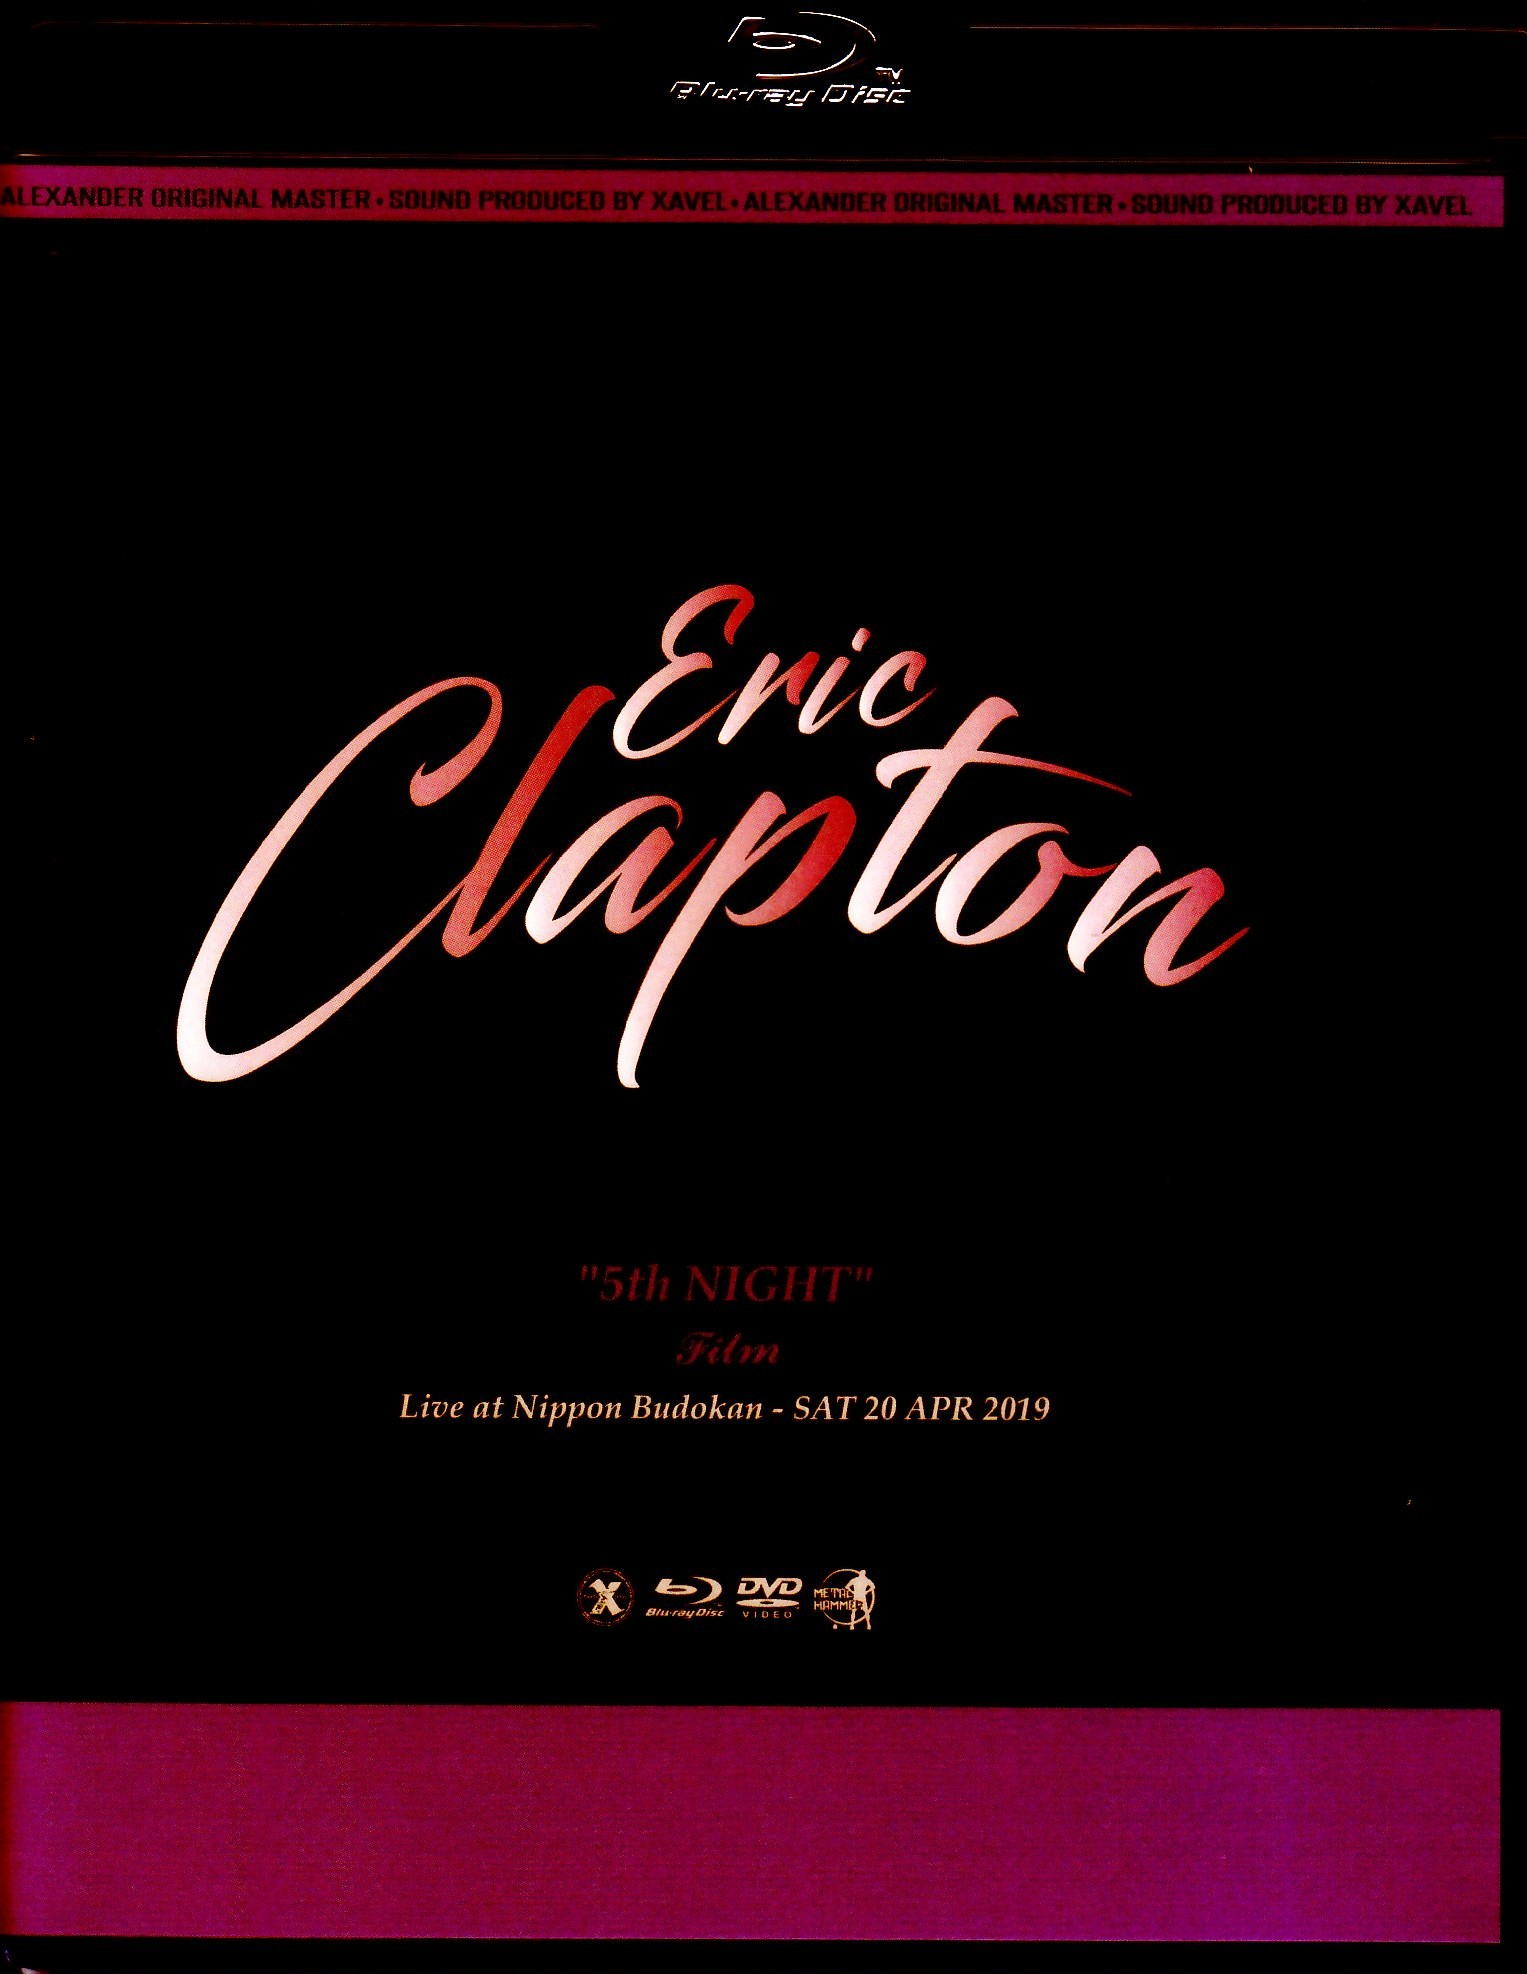 Eric Clapton エリック・クラプトン/Tokyo,Japan 4.20.2019 Blu-Ray & DVD Ver